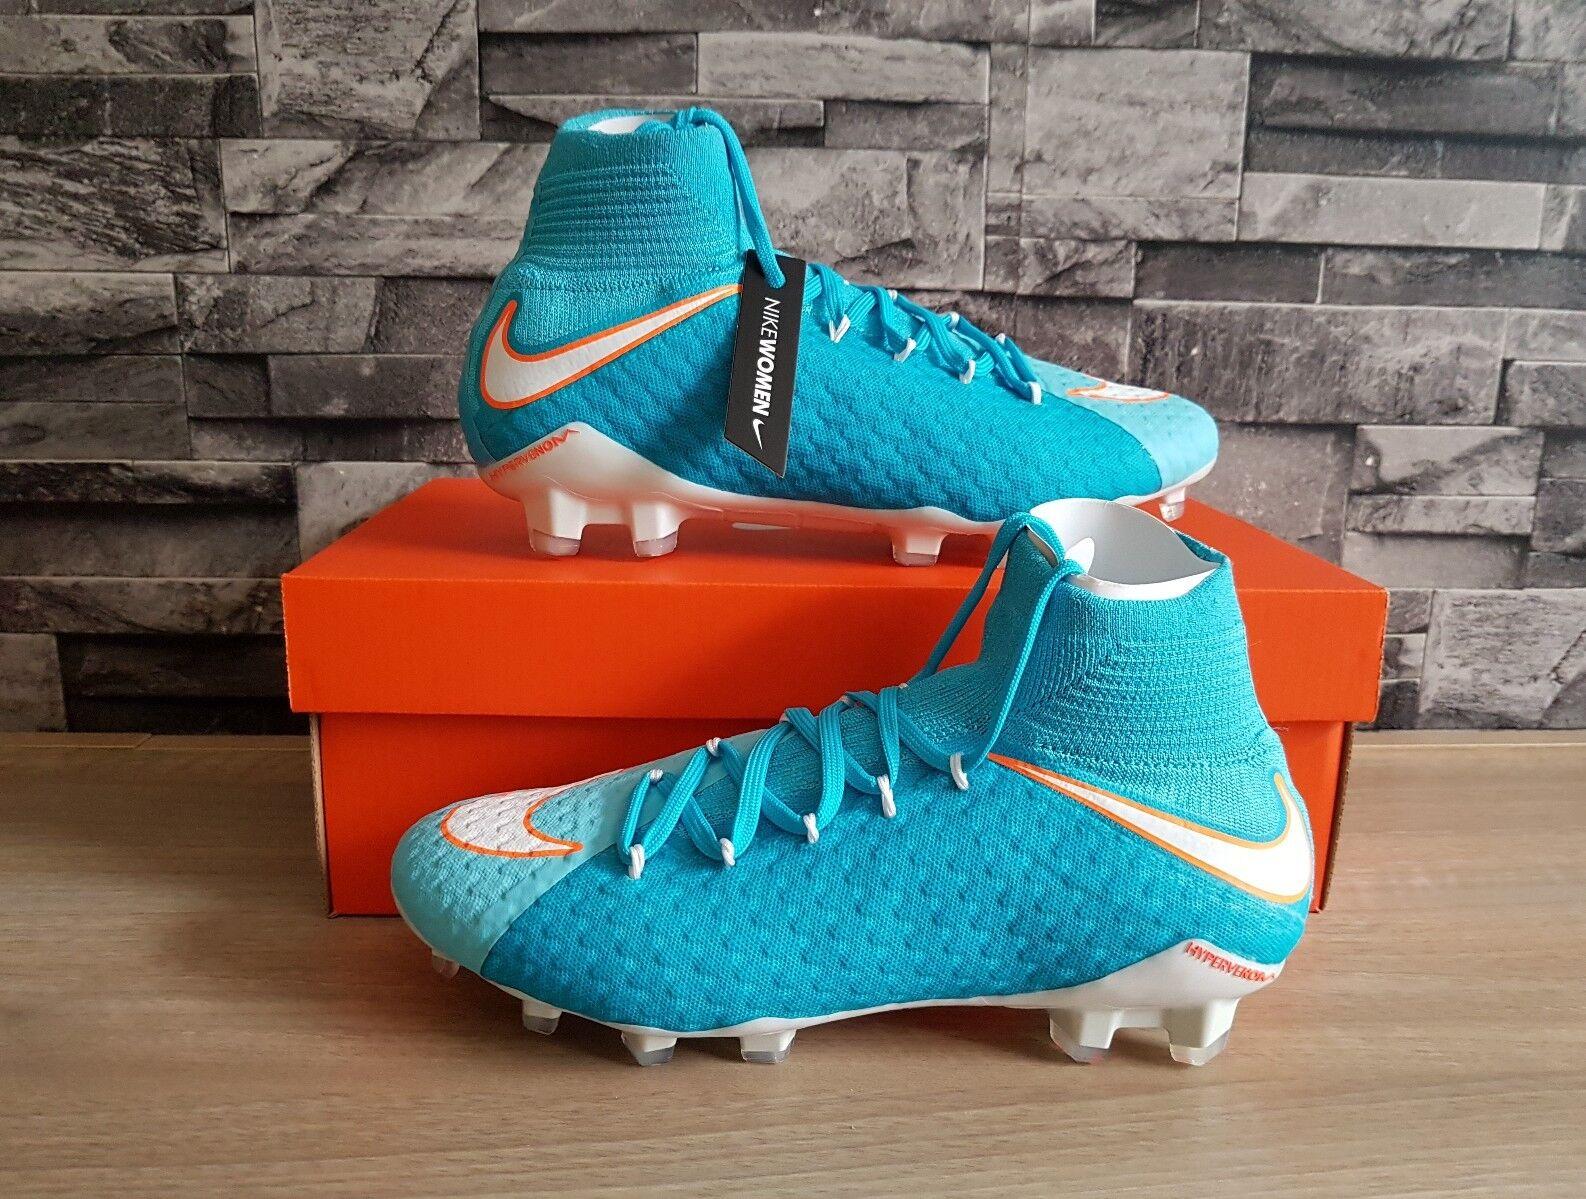 Wmns Nike Hypervenom Phatal III FG botas Tamaño Calcetín DF Talla 5.5 BNWB